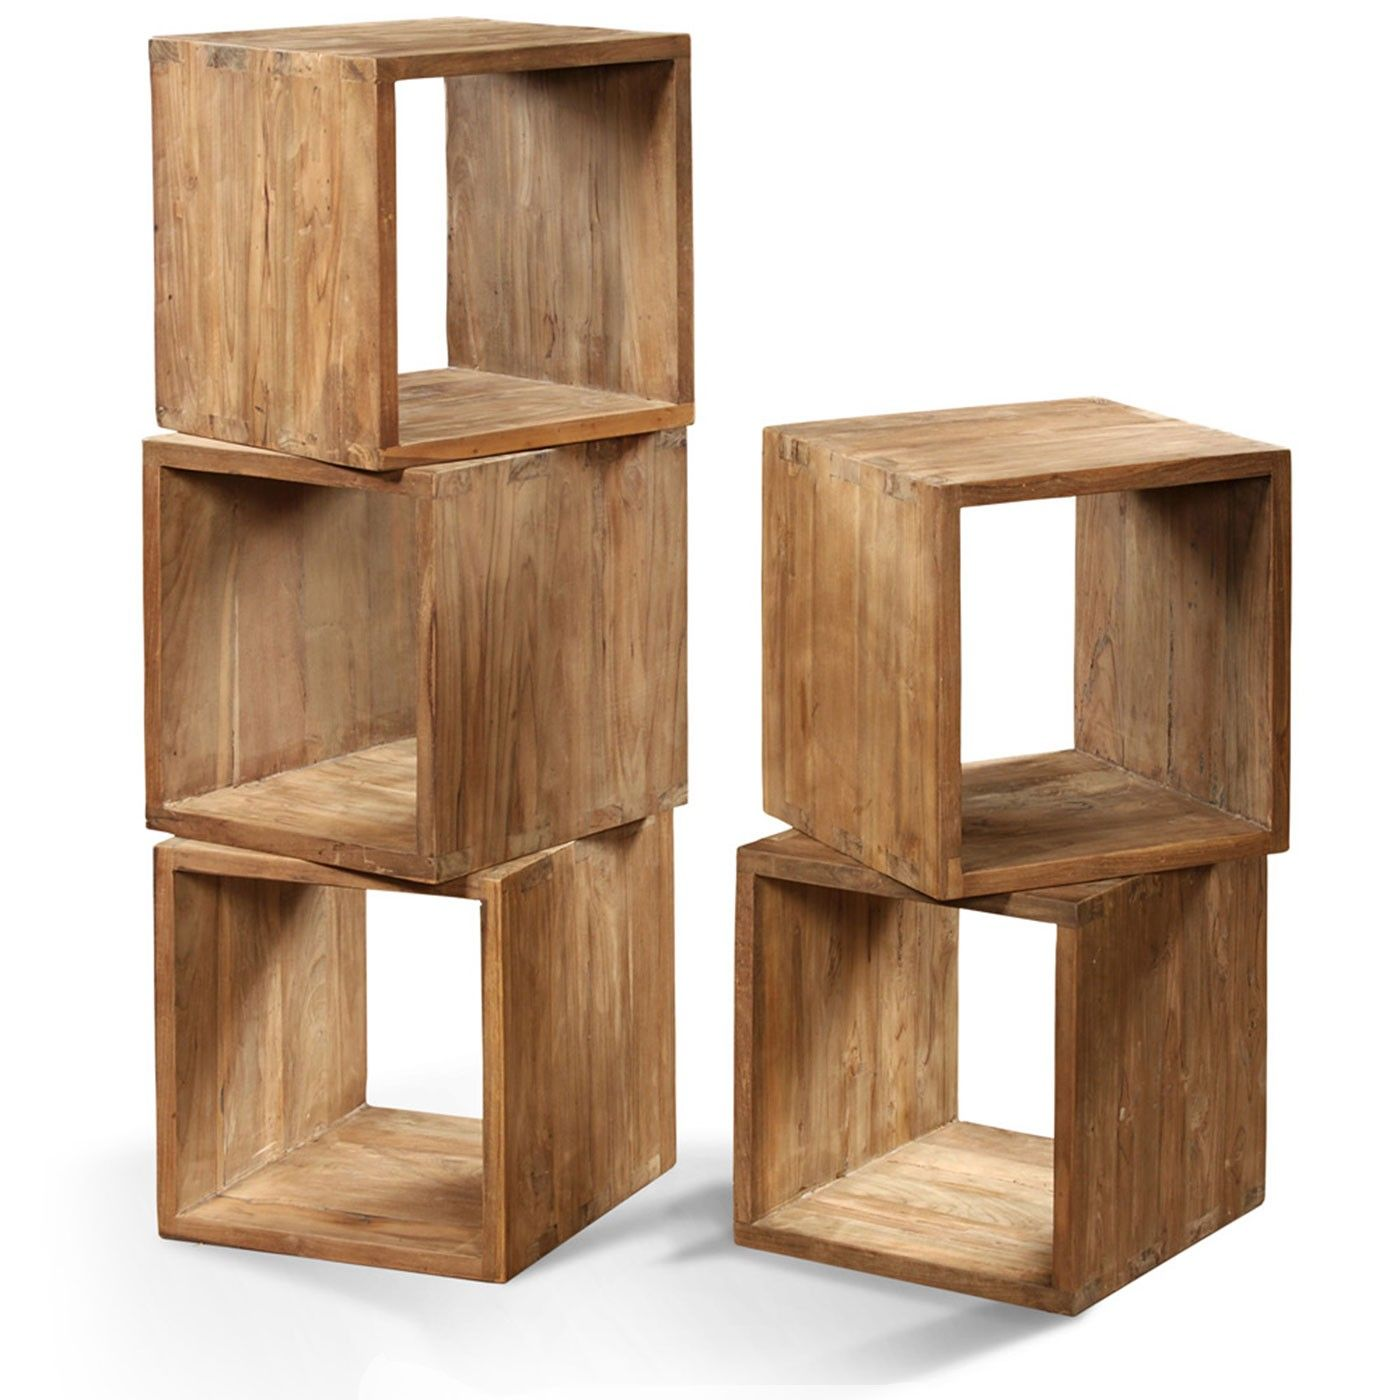 Lifestyle Storage Cube 2.5cm Frame | Storage cubes, Cube and Shelves